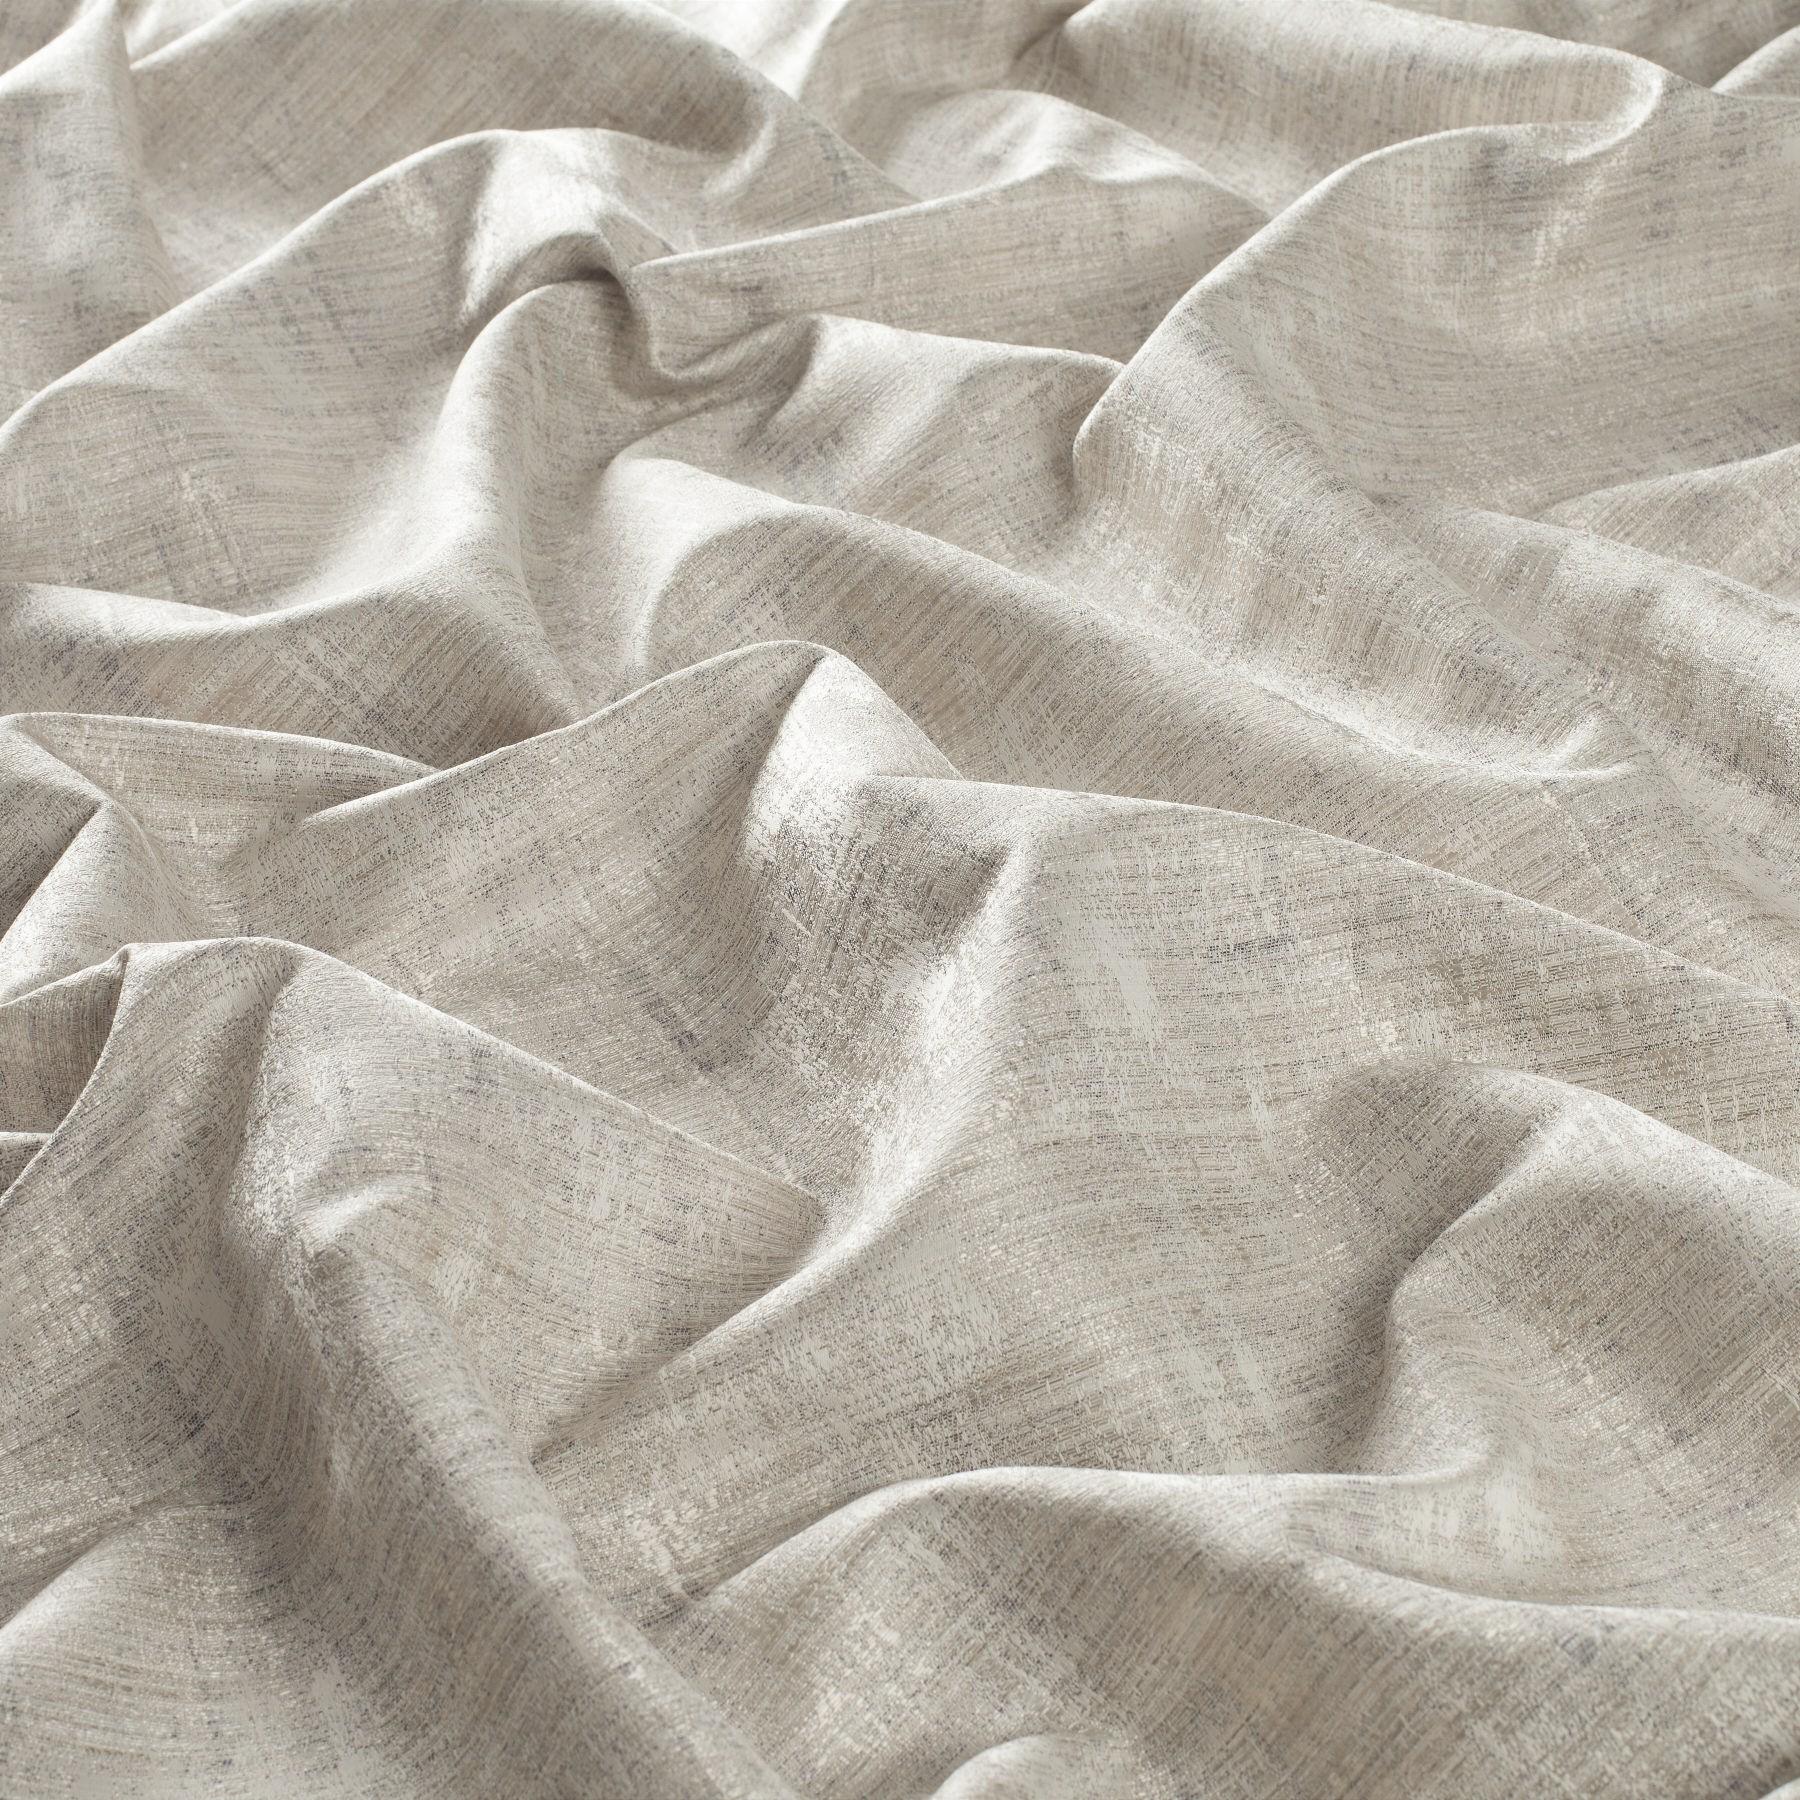 Decoration Fabric Kalahari 9 7877 070 Jab Anstoetz Fabrics